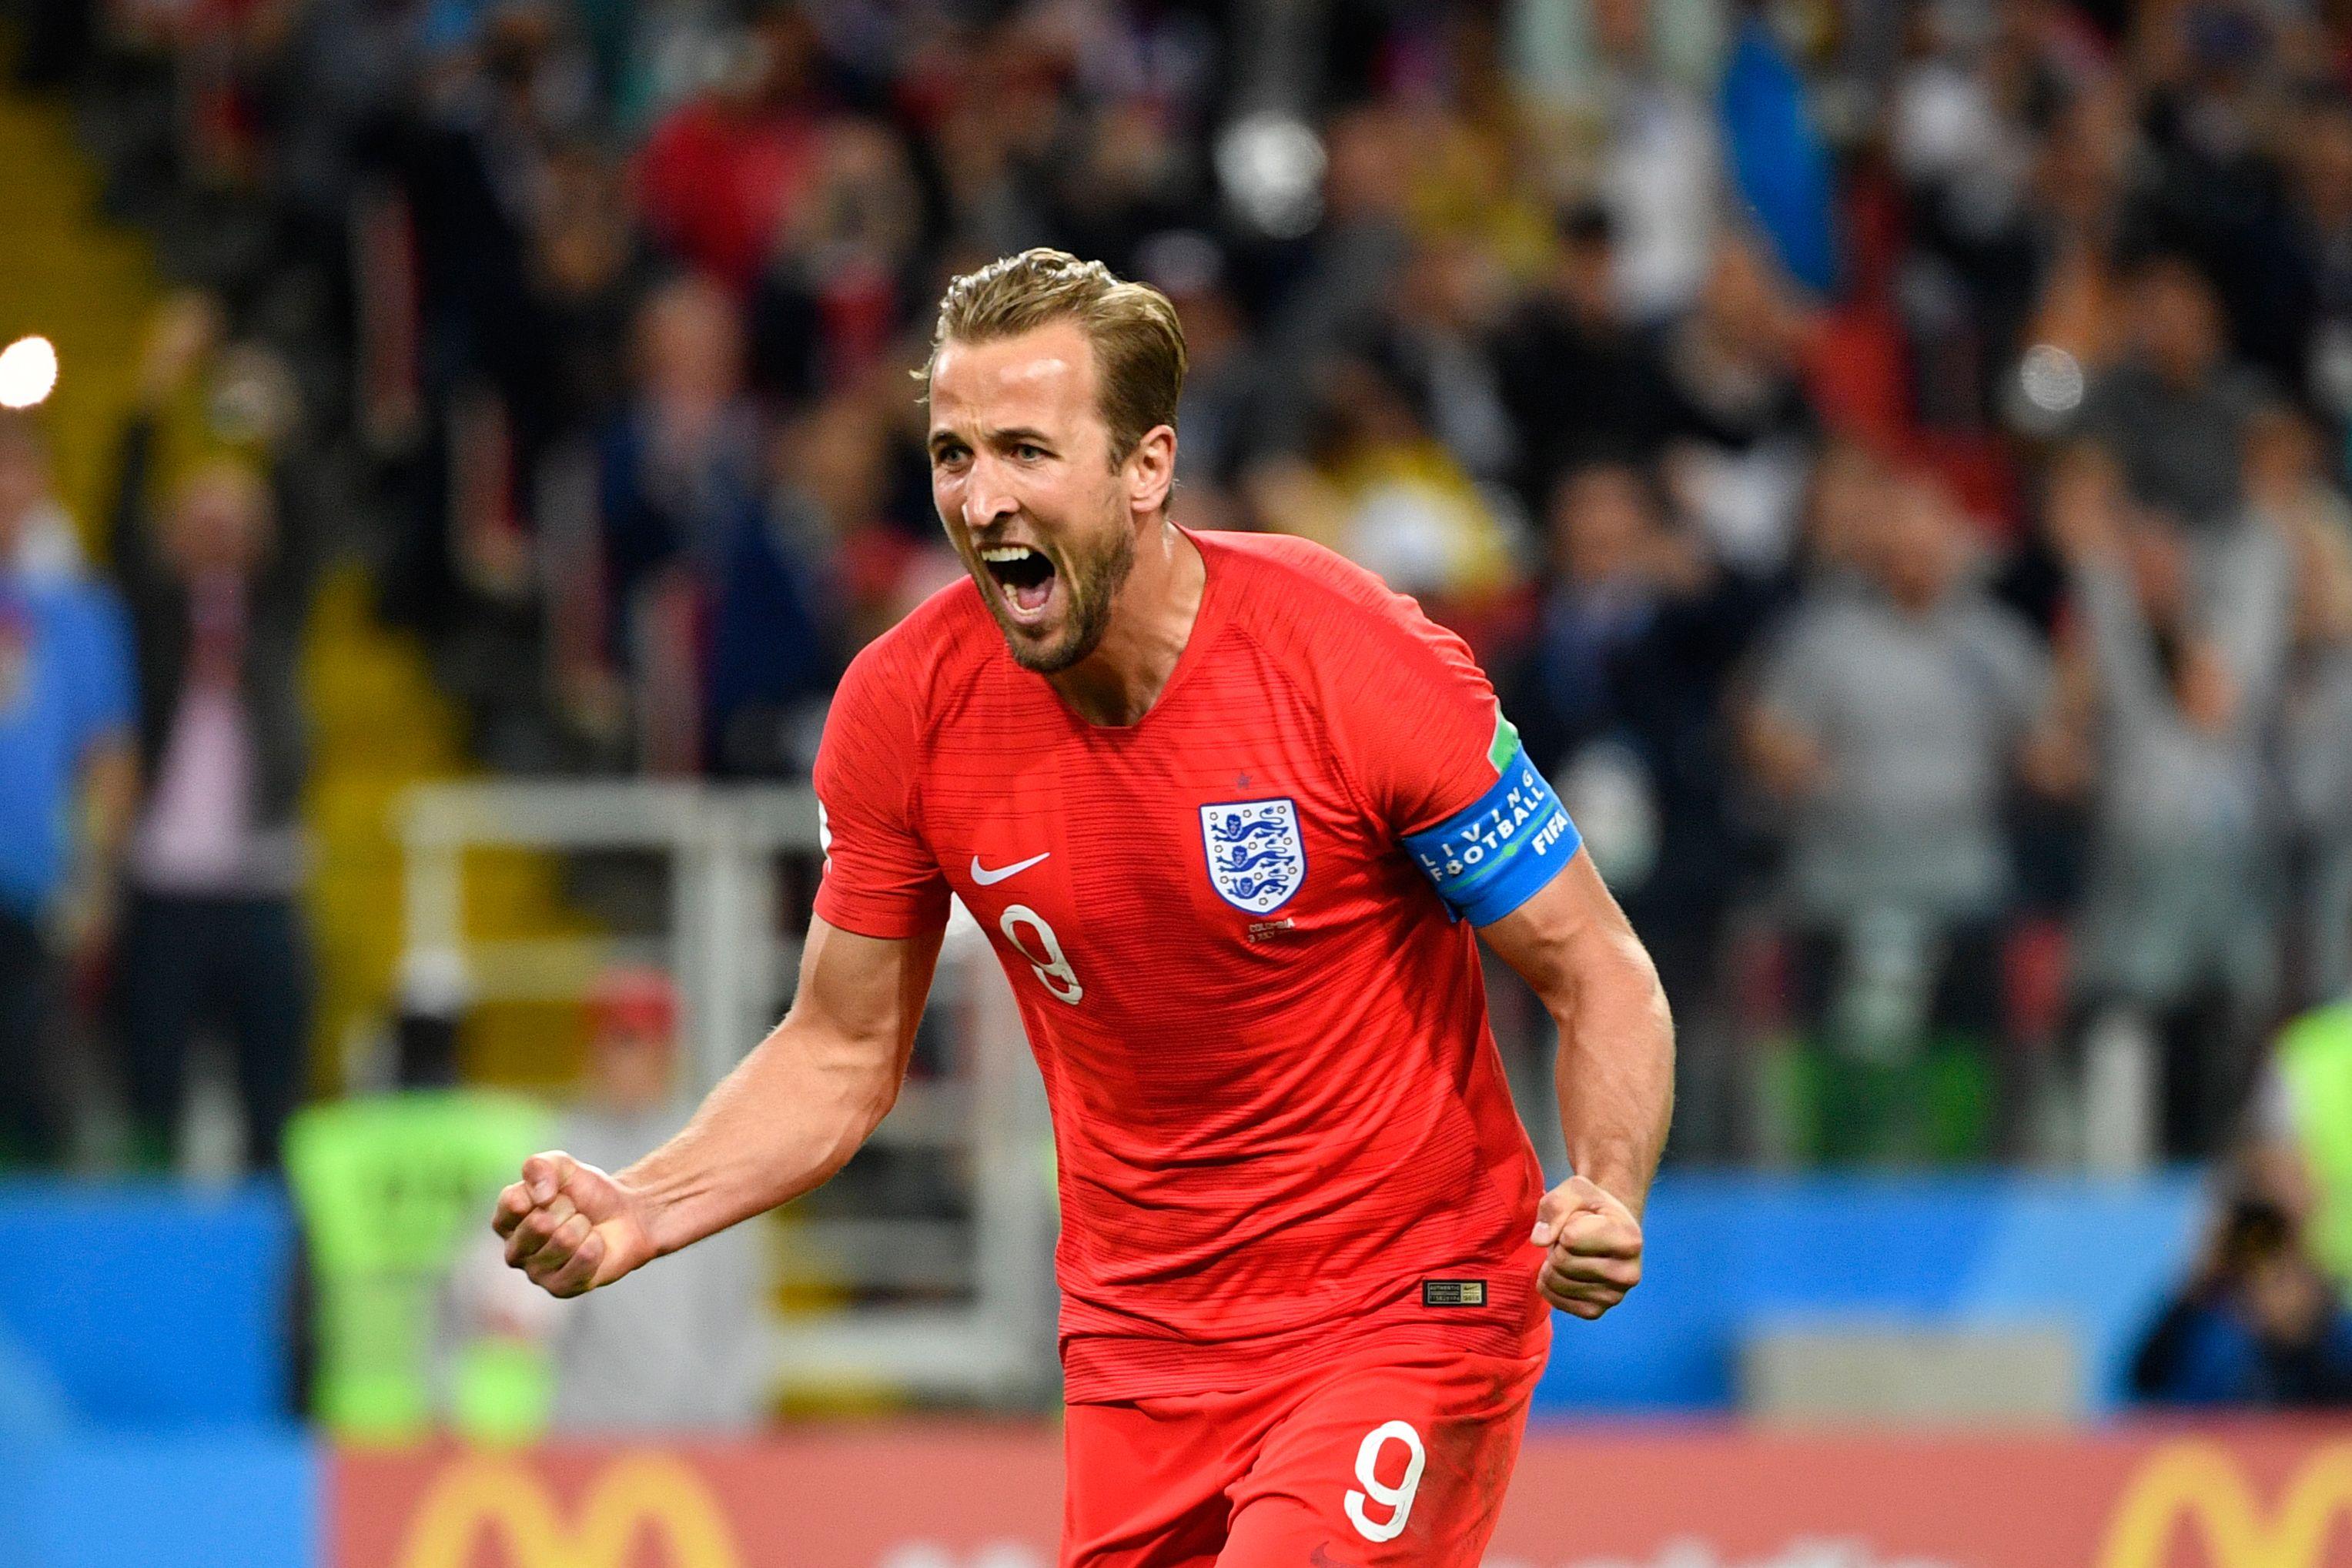 Harry-Kane-England-celeb